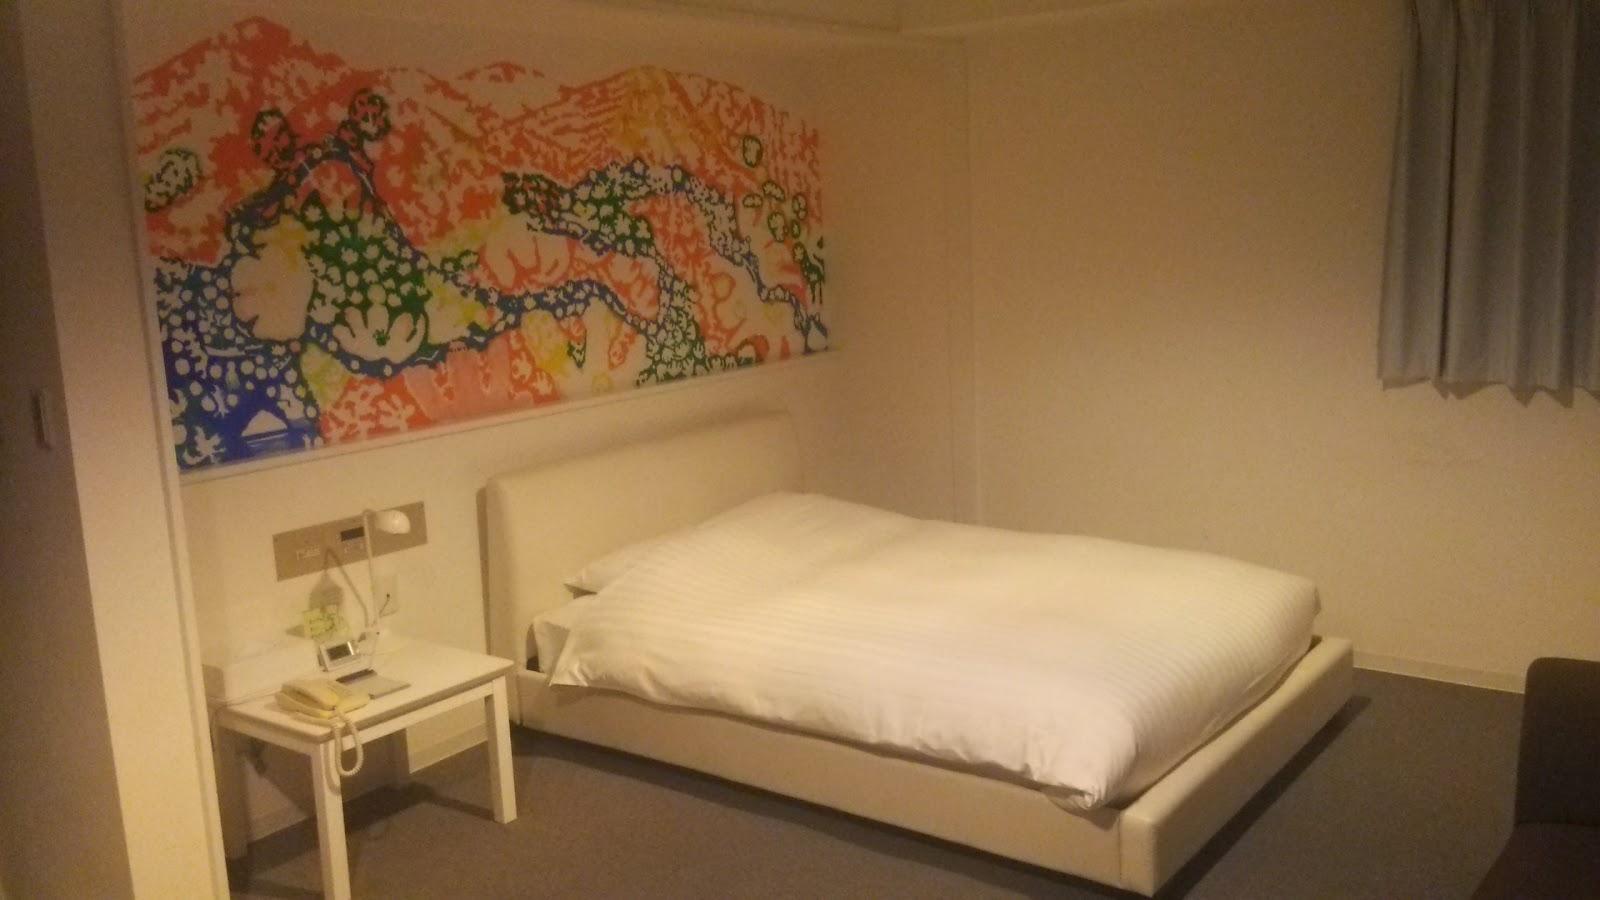 Art hotel color aomori - Art Hotel Color Aomori Art Hotel Color Aomori